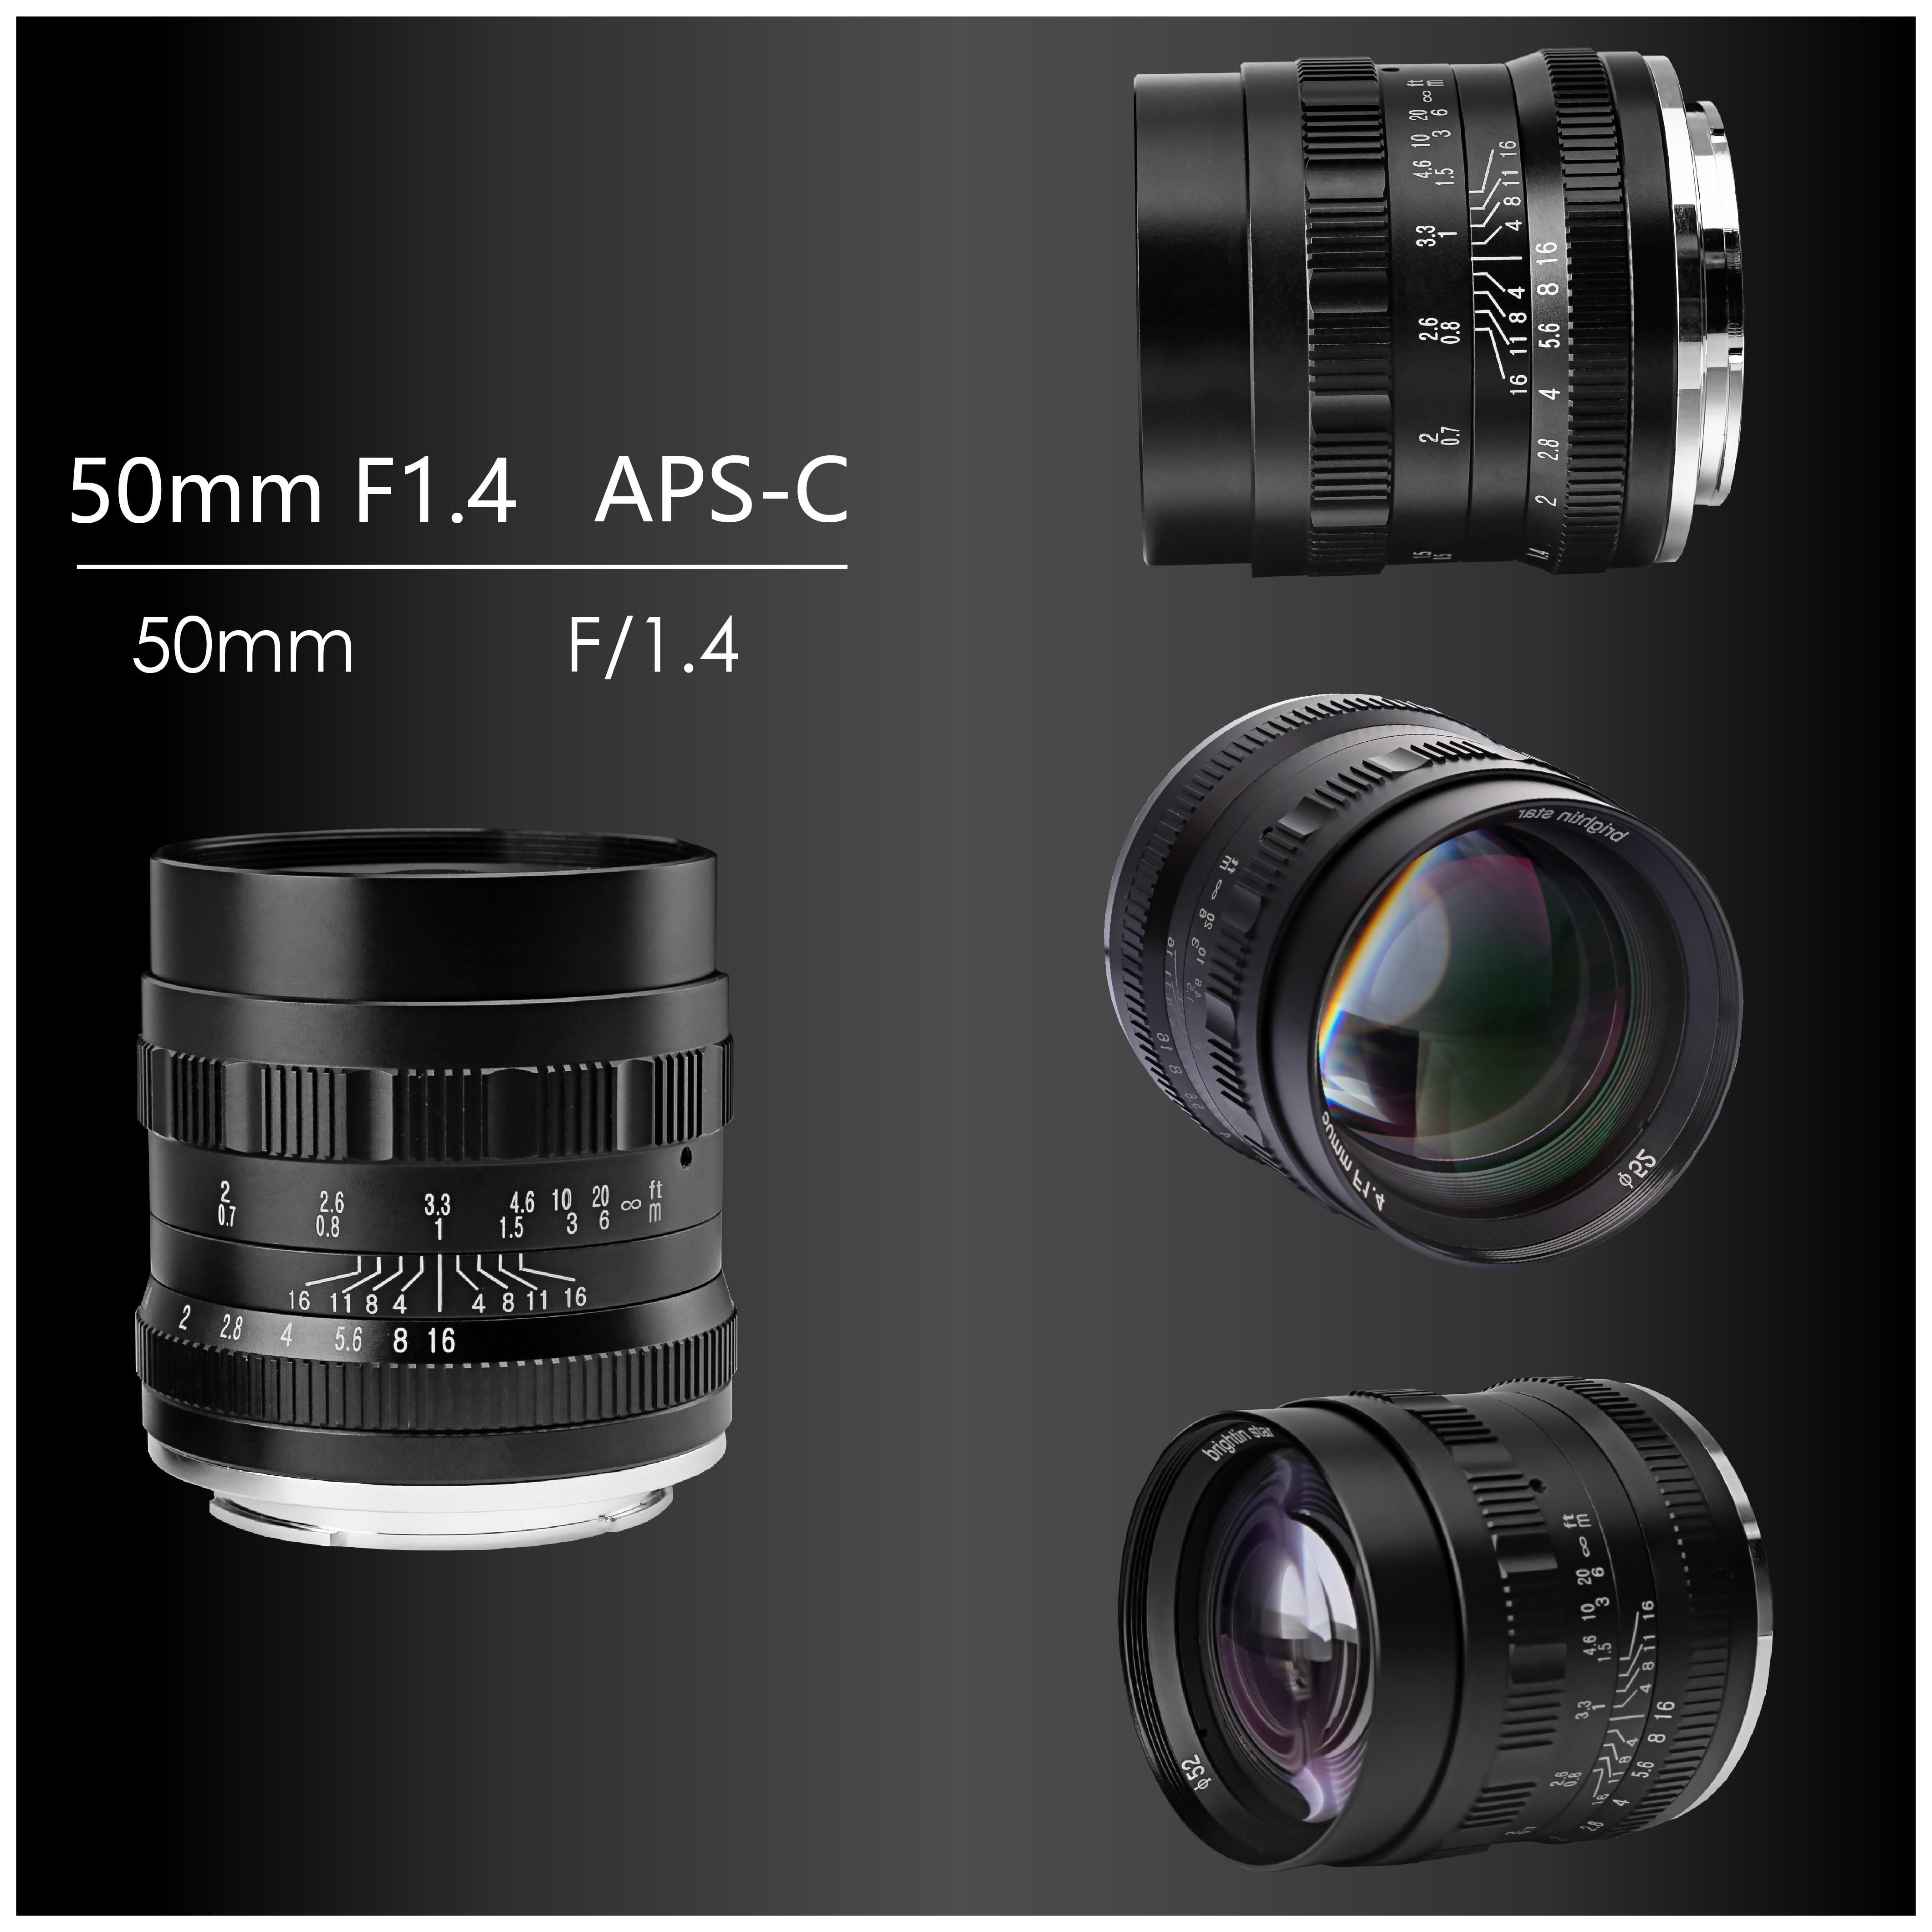 Lens Filters Mini 8 63-Piece Accessory Bundle Compatible for Fujifilm Instax Mini 9 More Mini 8+ Black Includes; Case Instant Film Camera Plastic Frames Photo Album Close-Up